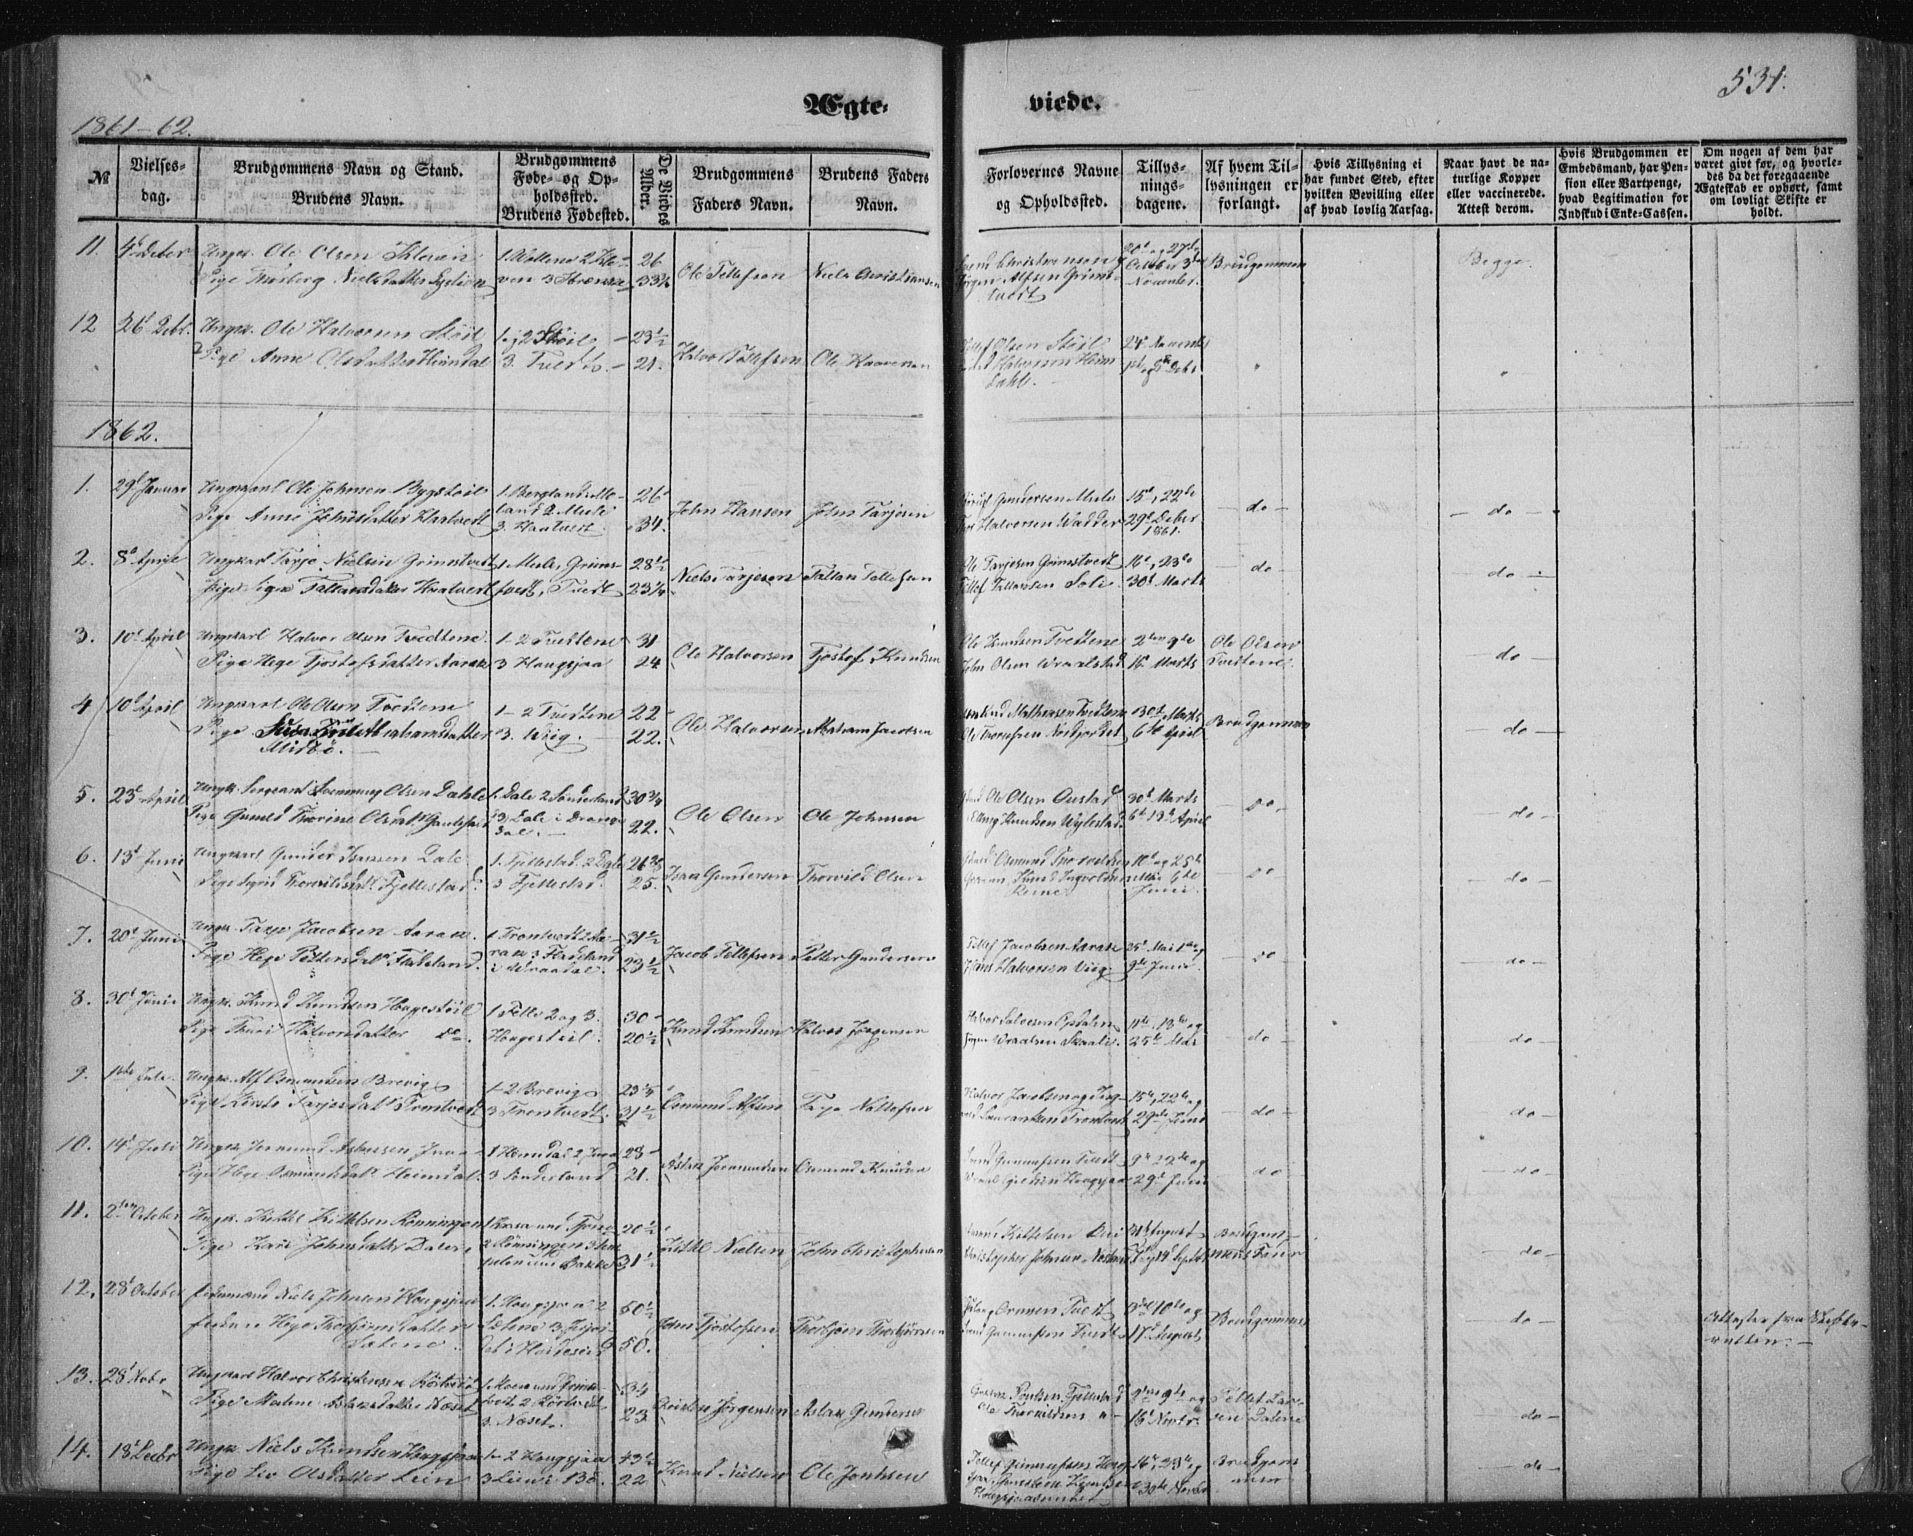 SAKO, Nissedal kirkebøker, F/Fa/L0003: Ministerialbok nr. I 3, 1846-1870, s. 530-531